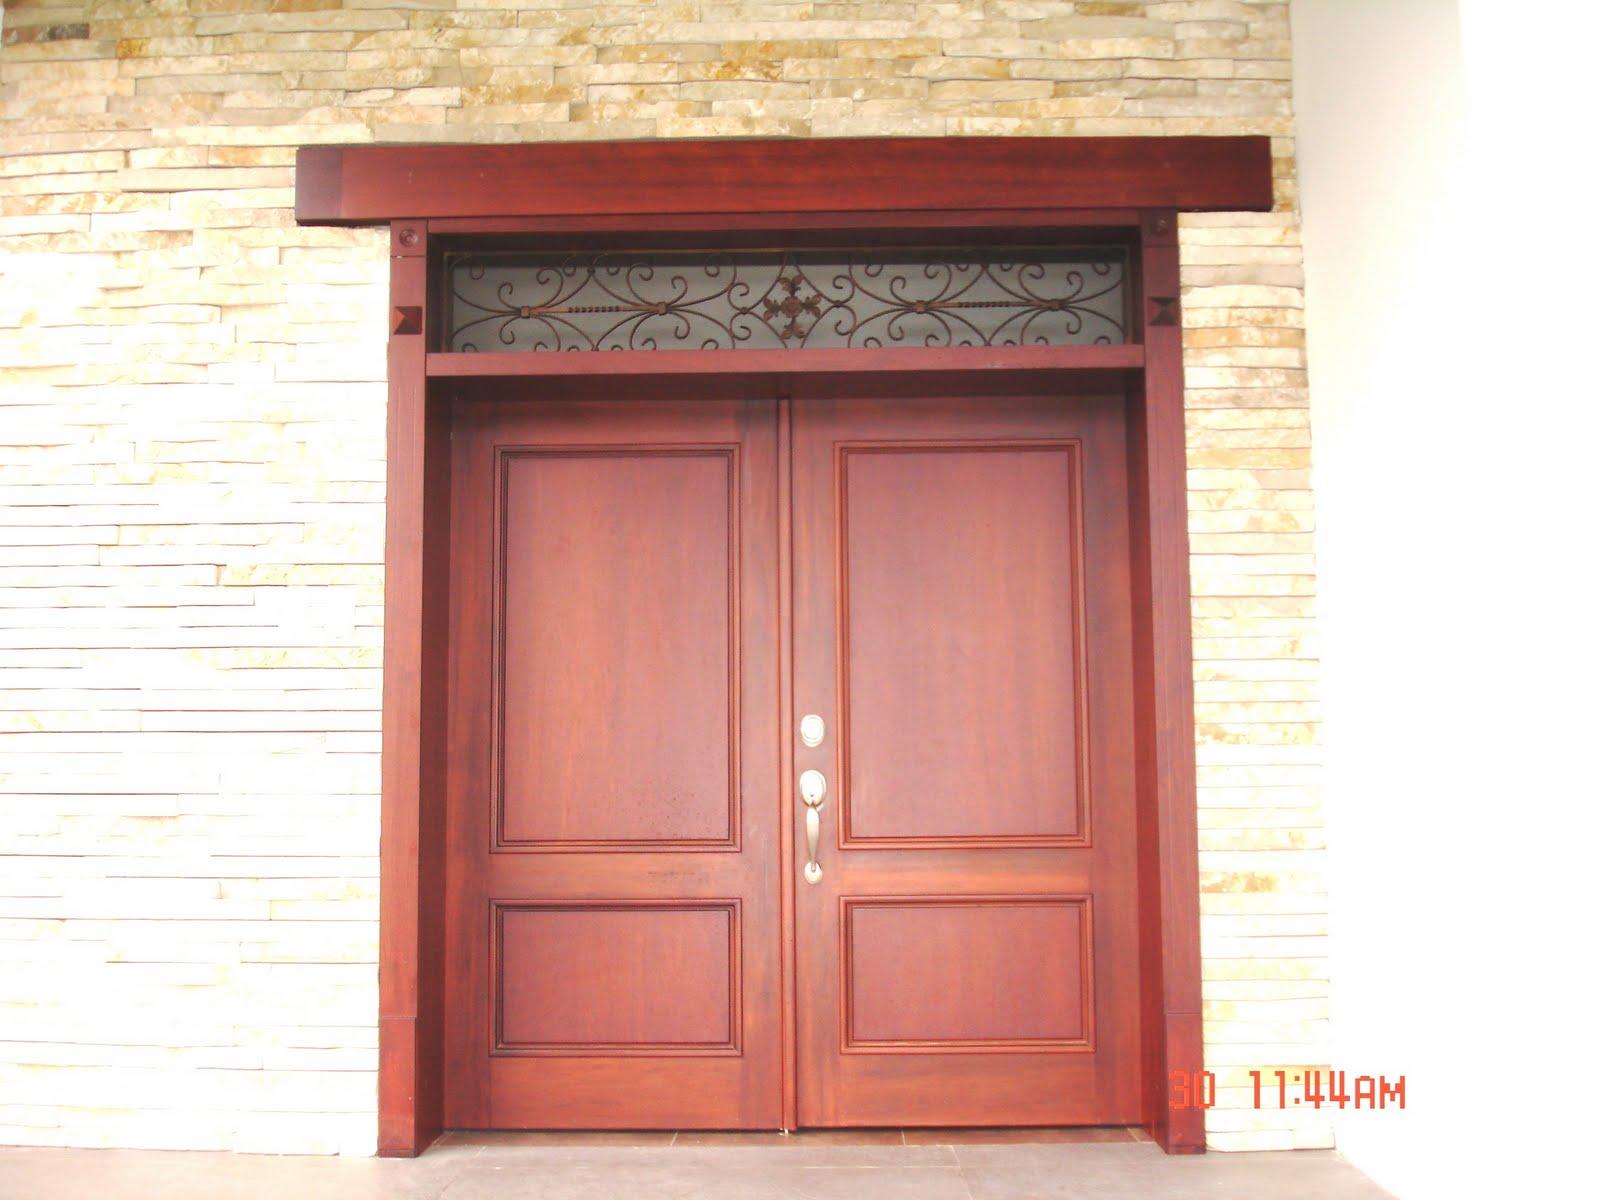 Ideatumobiliario puertas interiores y exteriores para su for Puertas exteriores modernas para casas